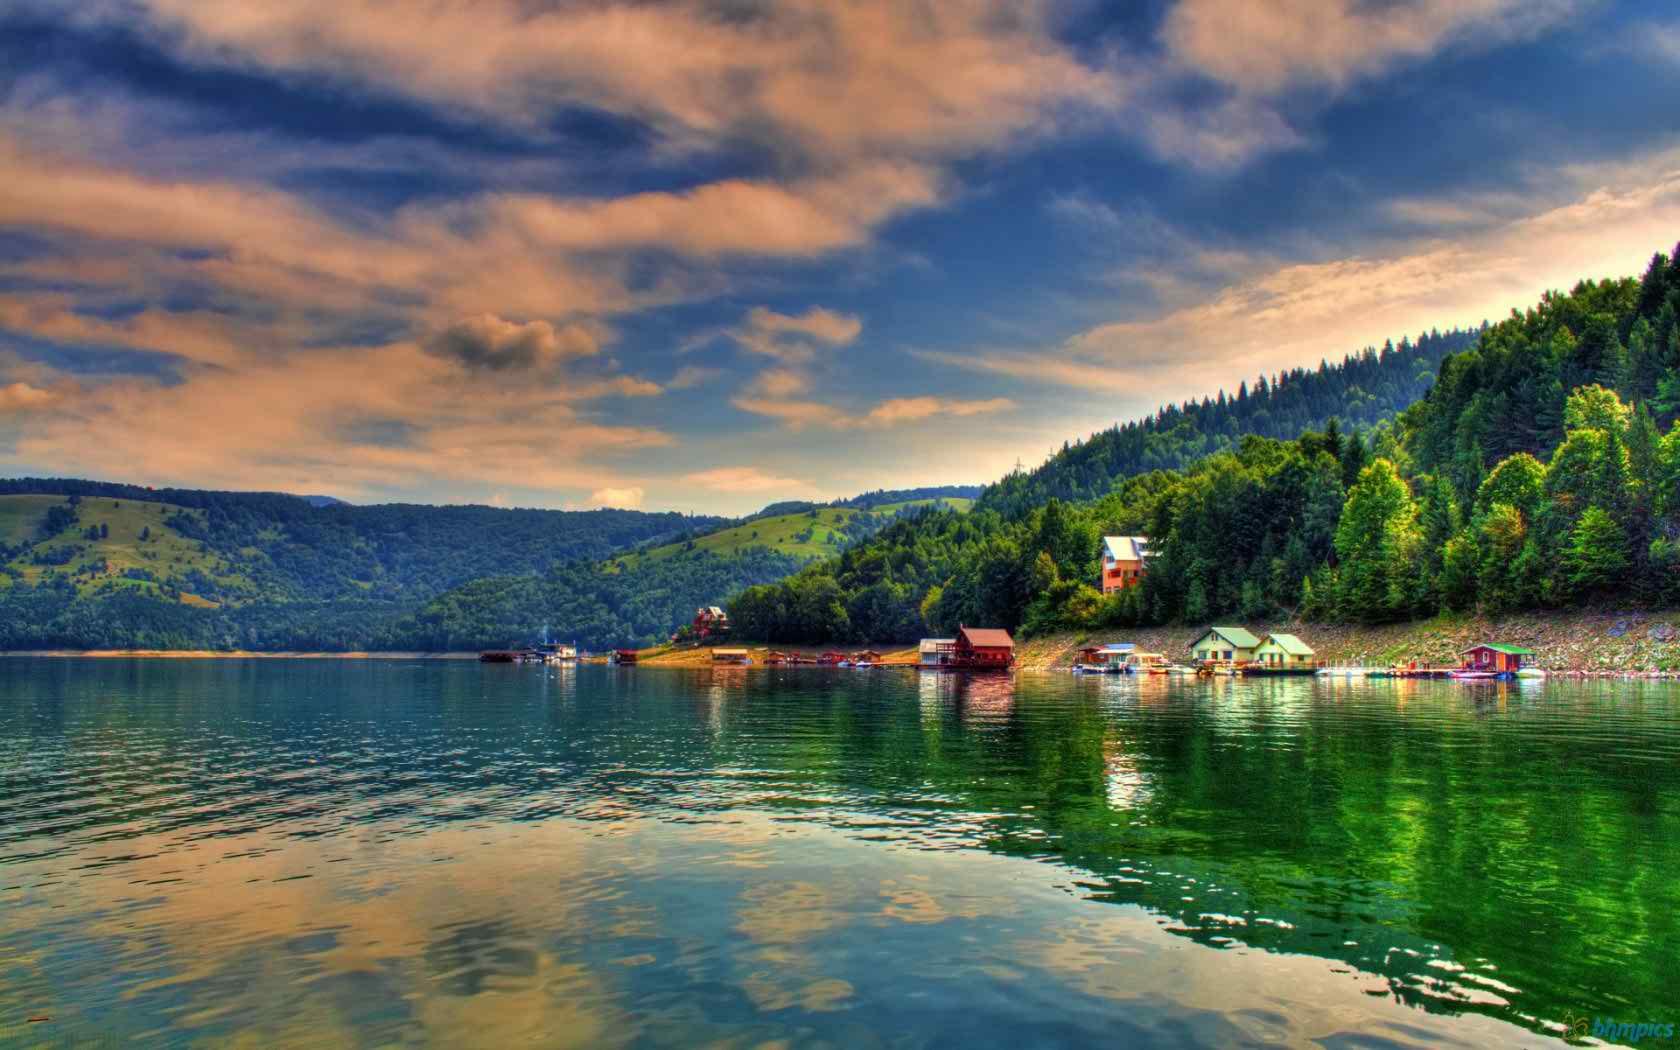 lake romania wallpapers image